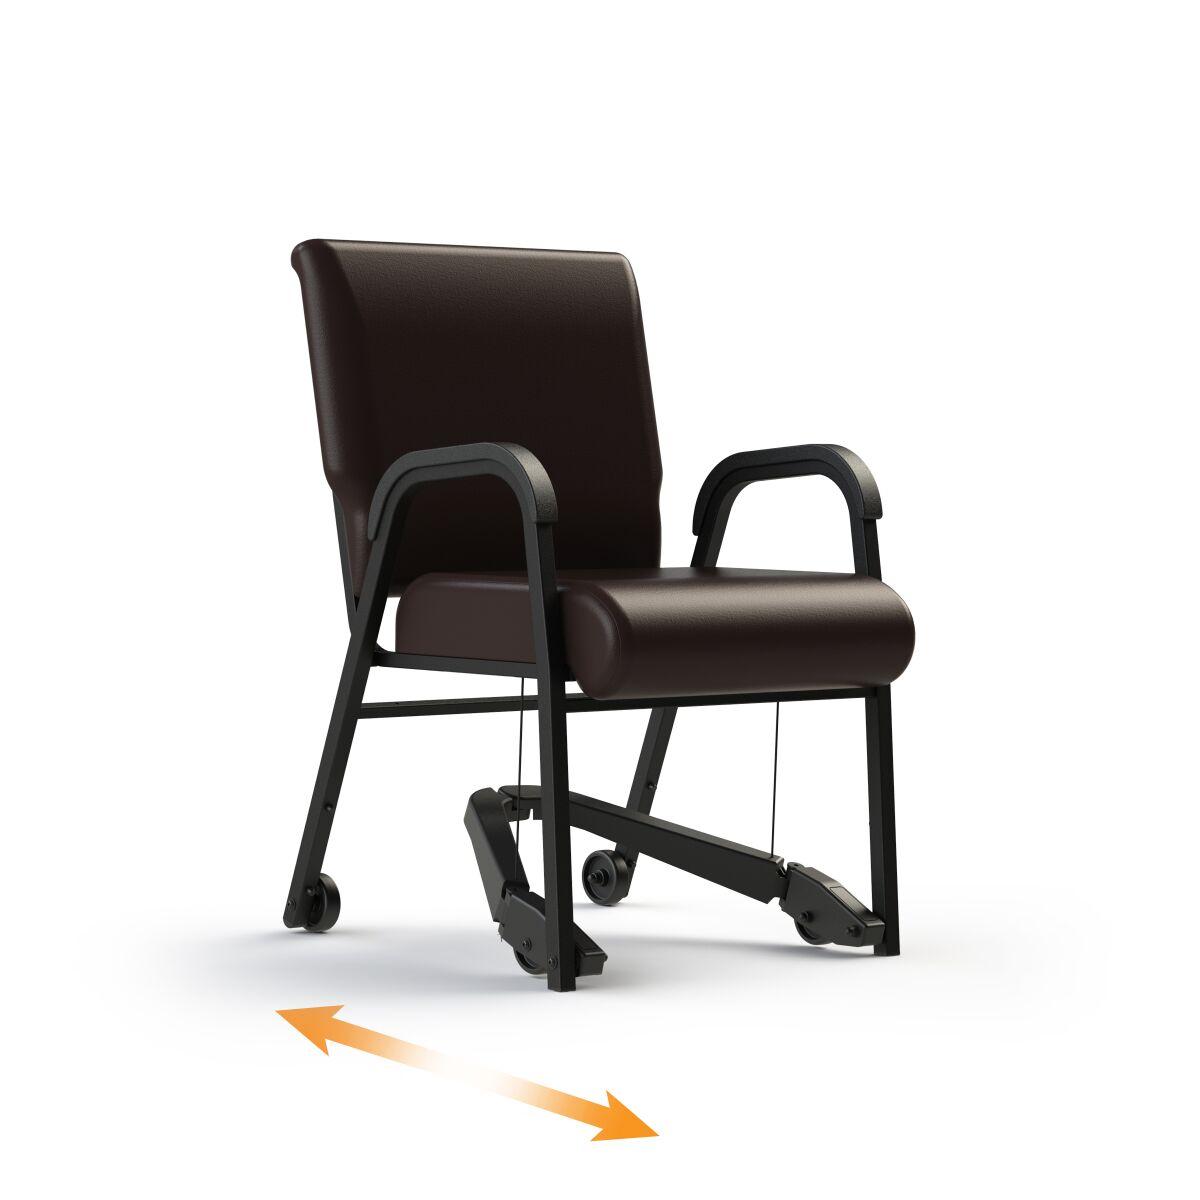 ComforTek Titan Bariatric Mobility Assist Chair w/Casters 33lbs